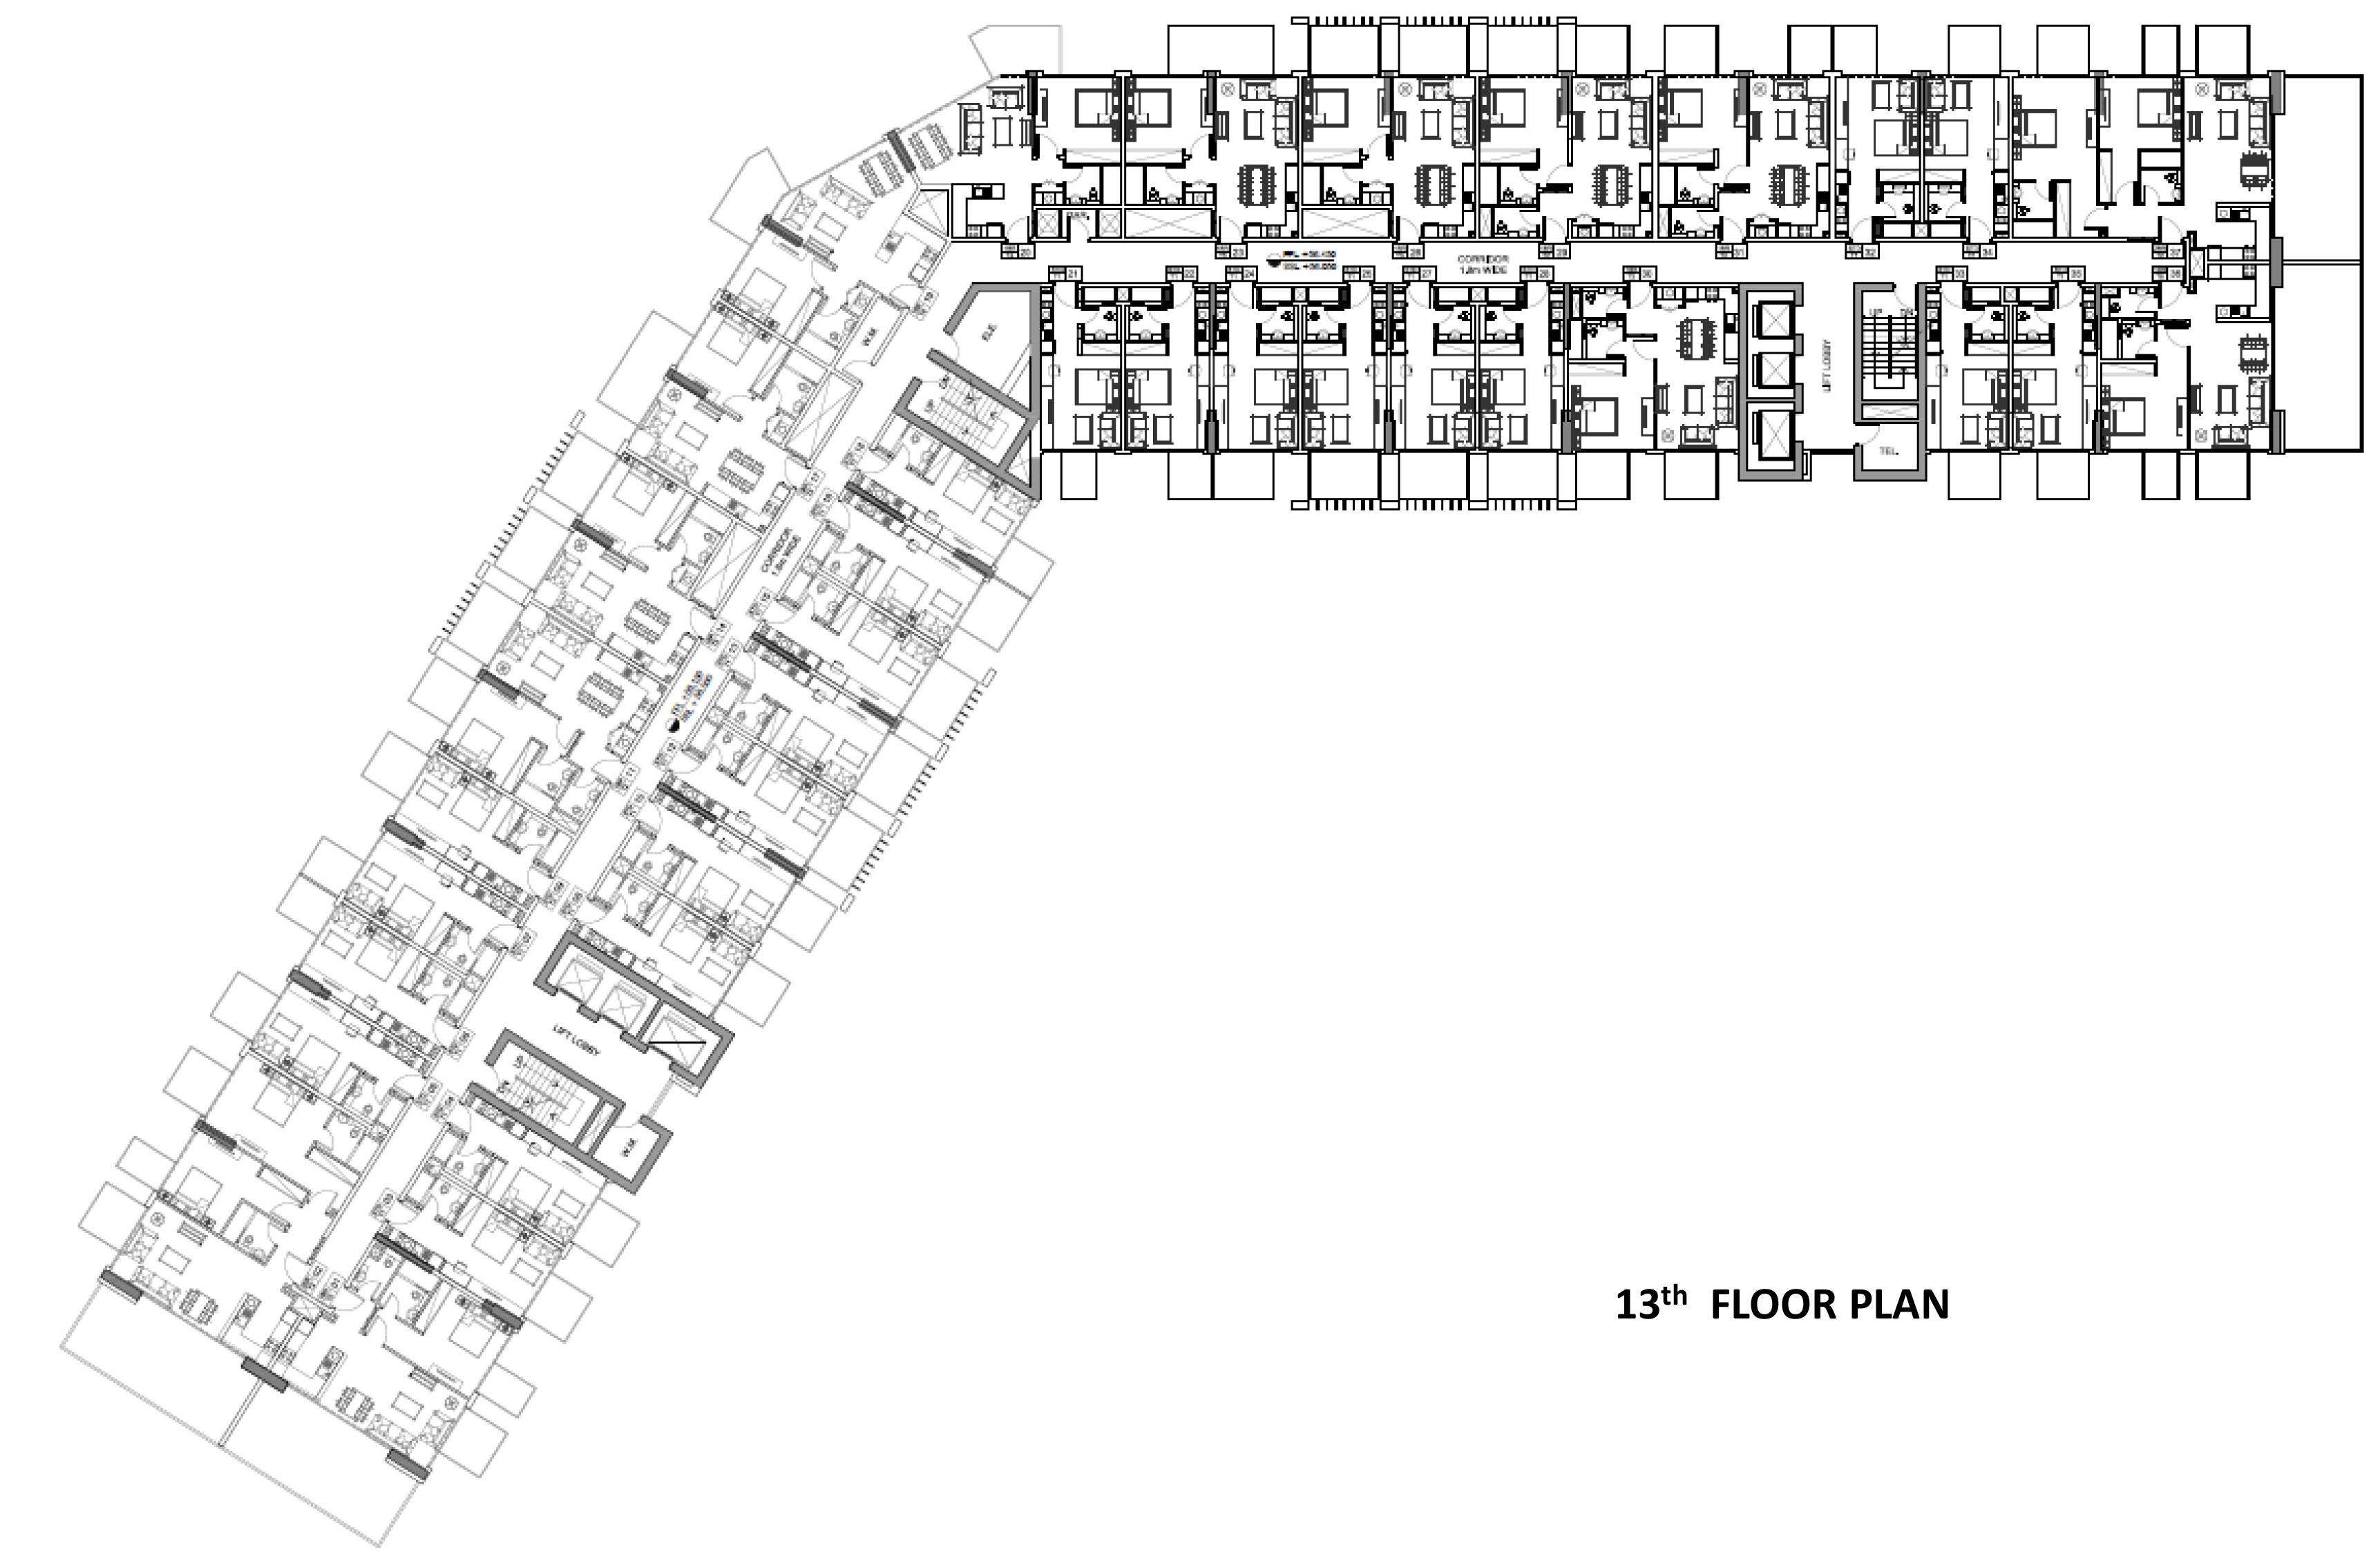 Farhad azizi residence health care city floor plan for 13th floor design